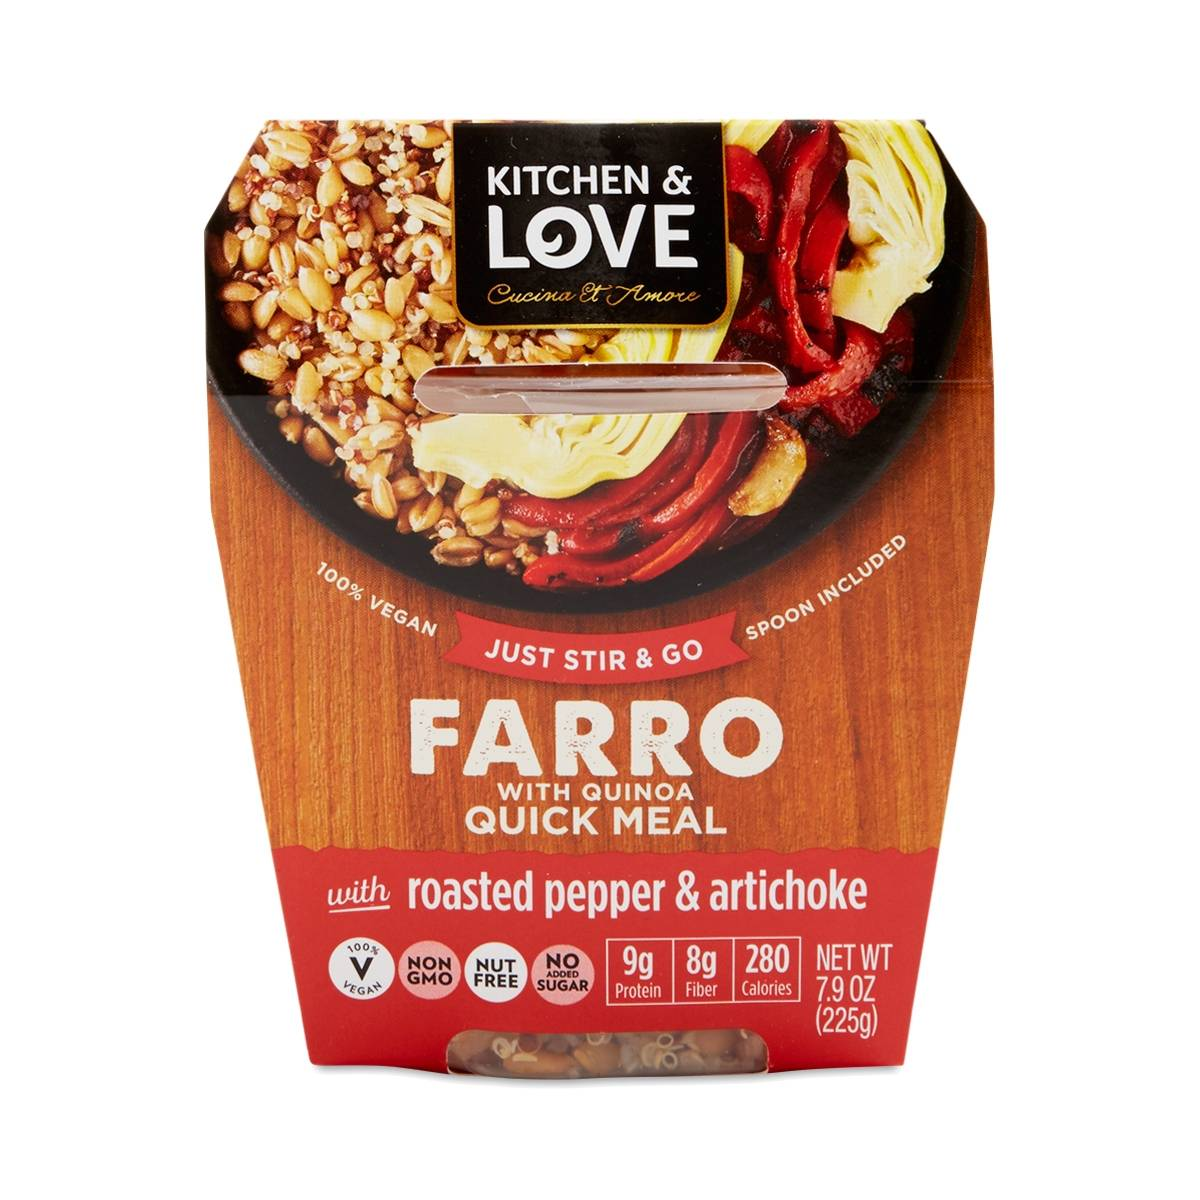 Roasted Pepper & Artichoke Farro Quinoa Meal - Thrive Market